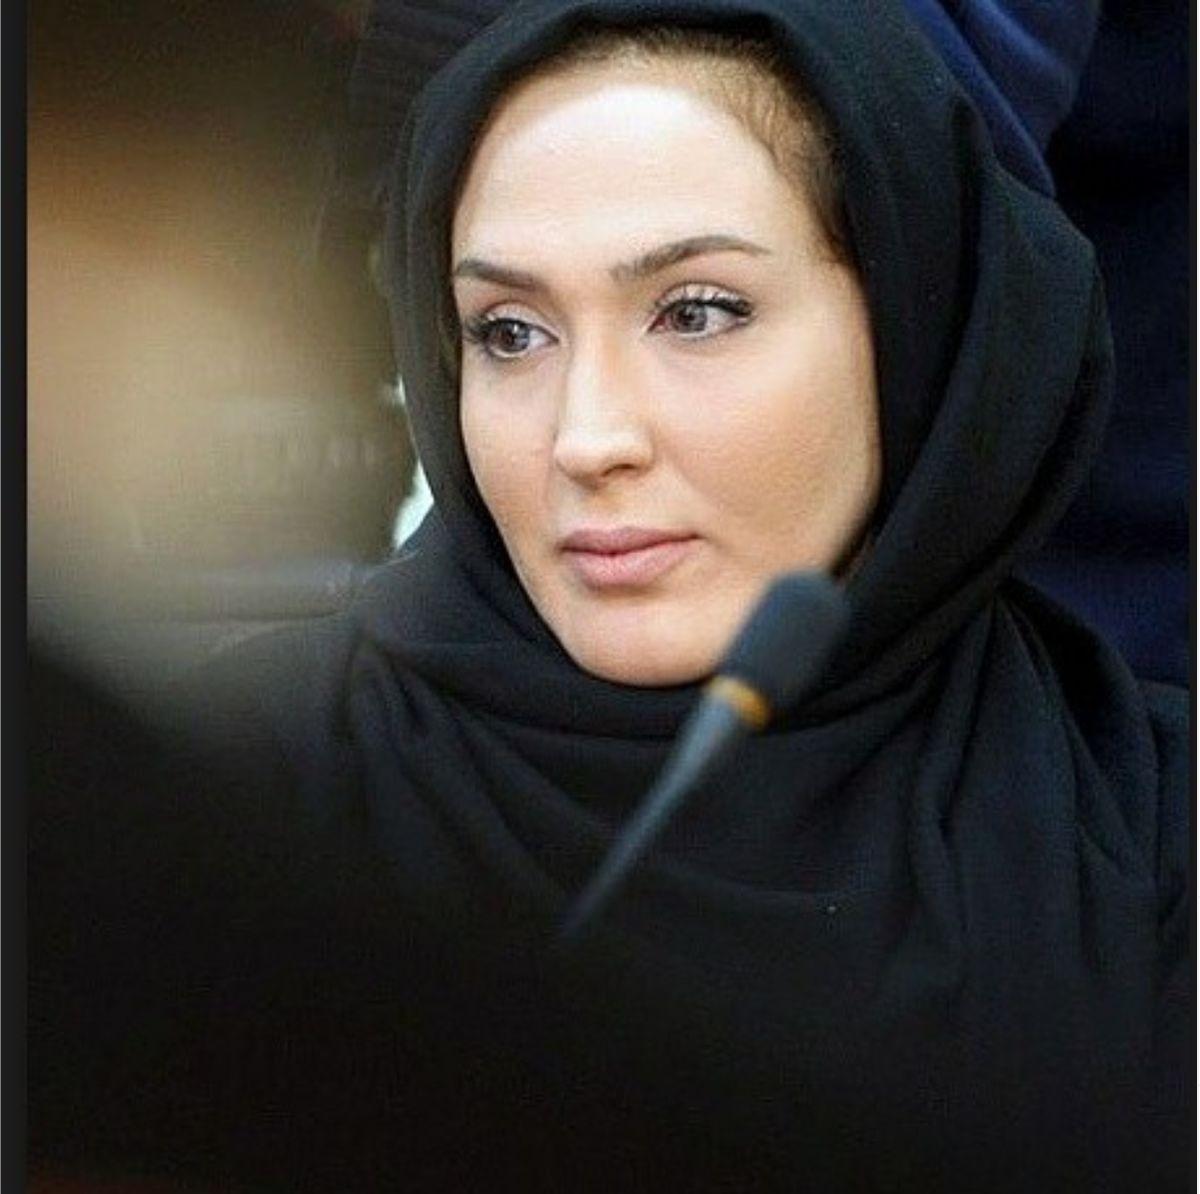 زهره فکور صبور چادری شد+ عکس